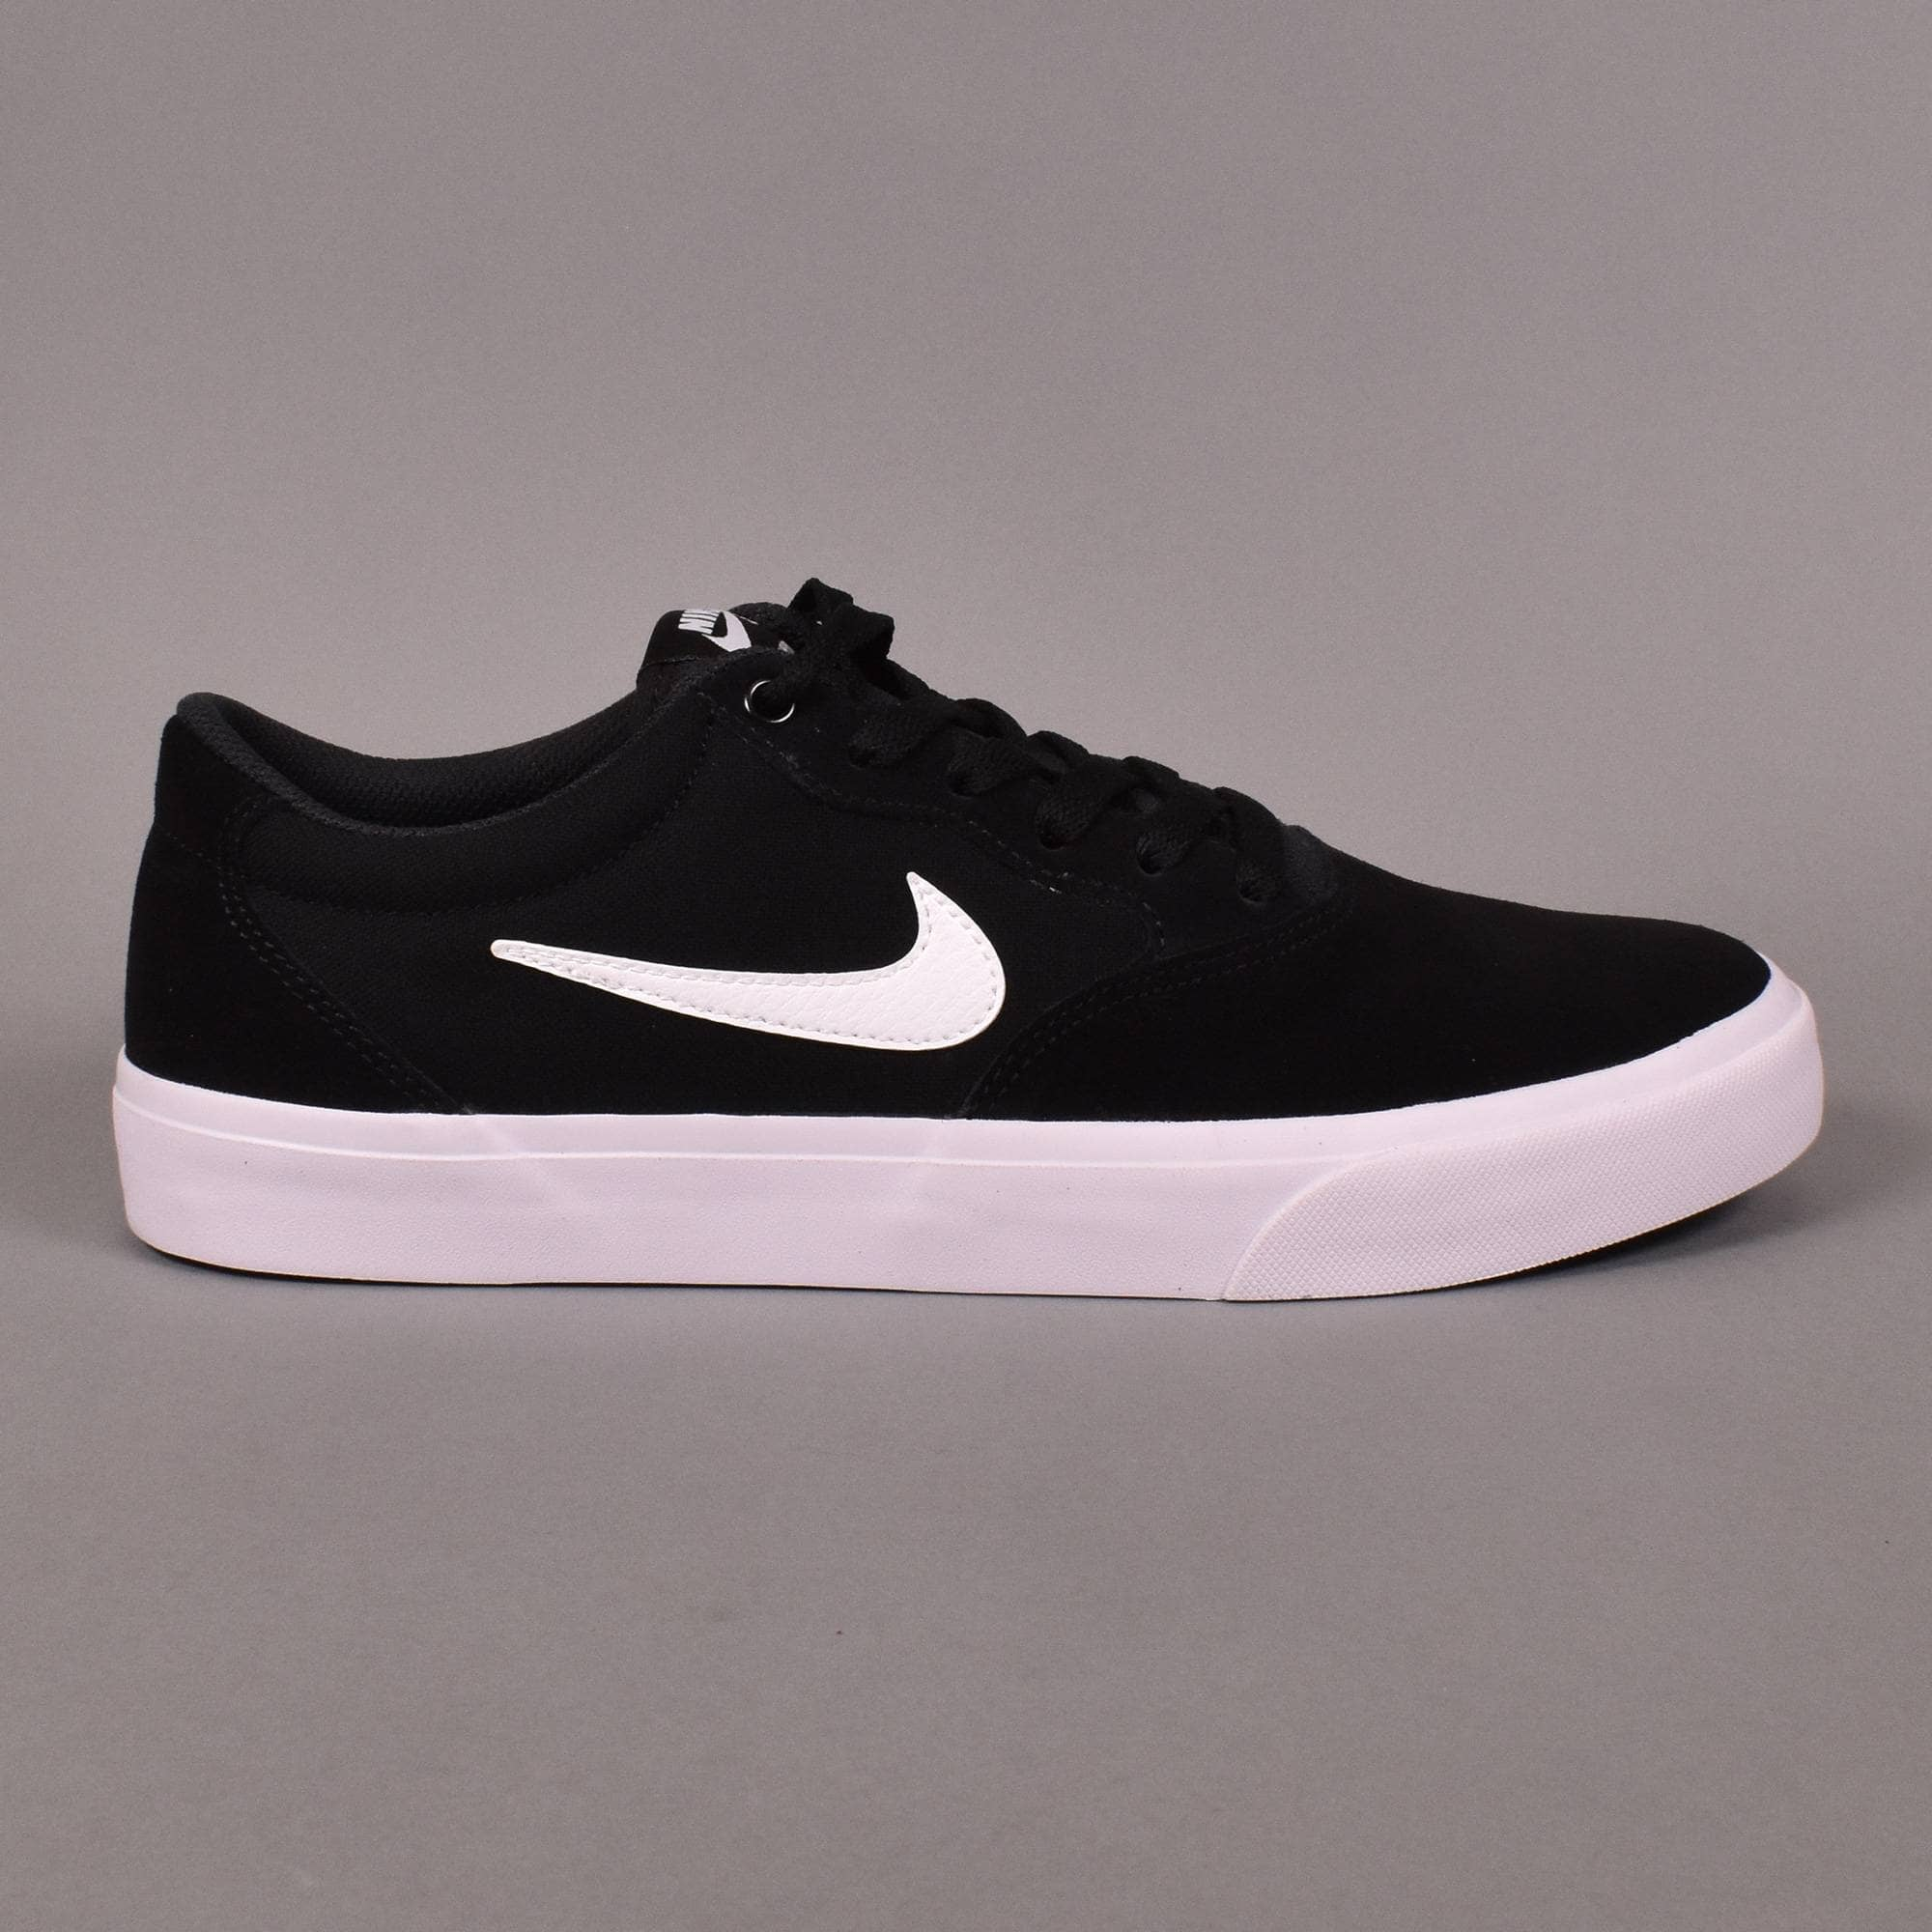 nike sb shoes black - 51% remise - www